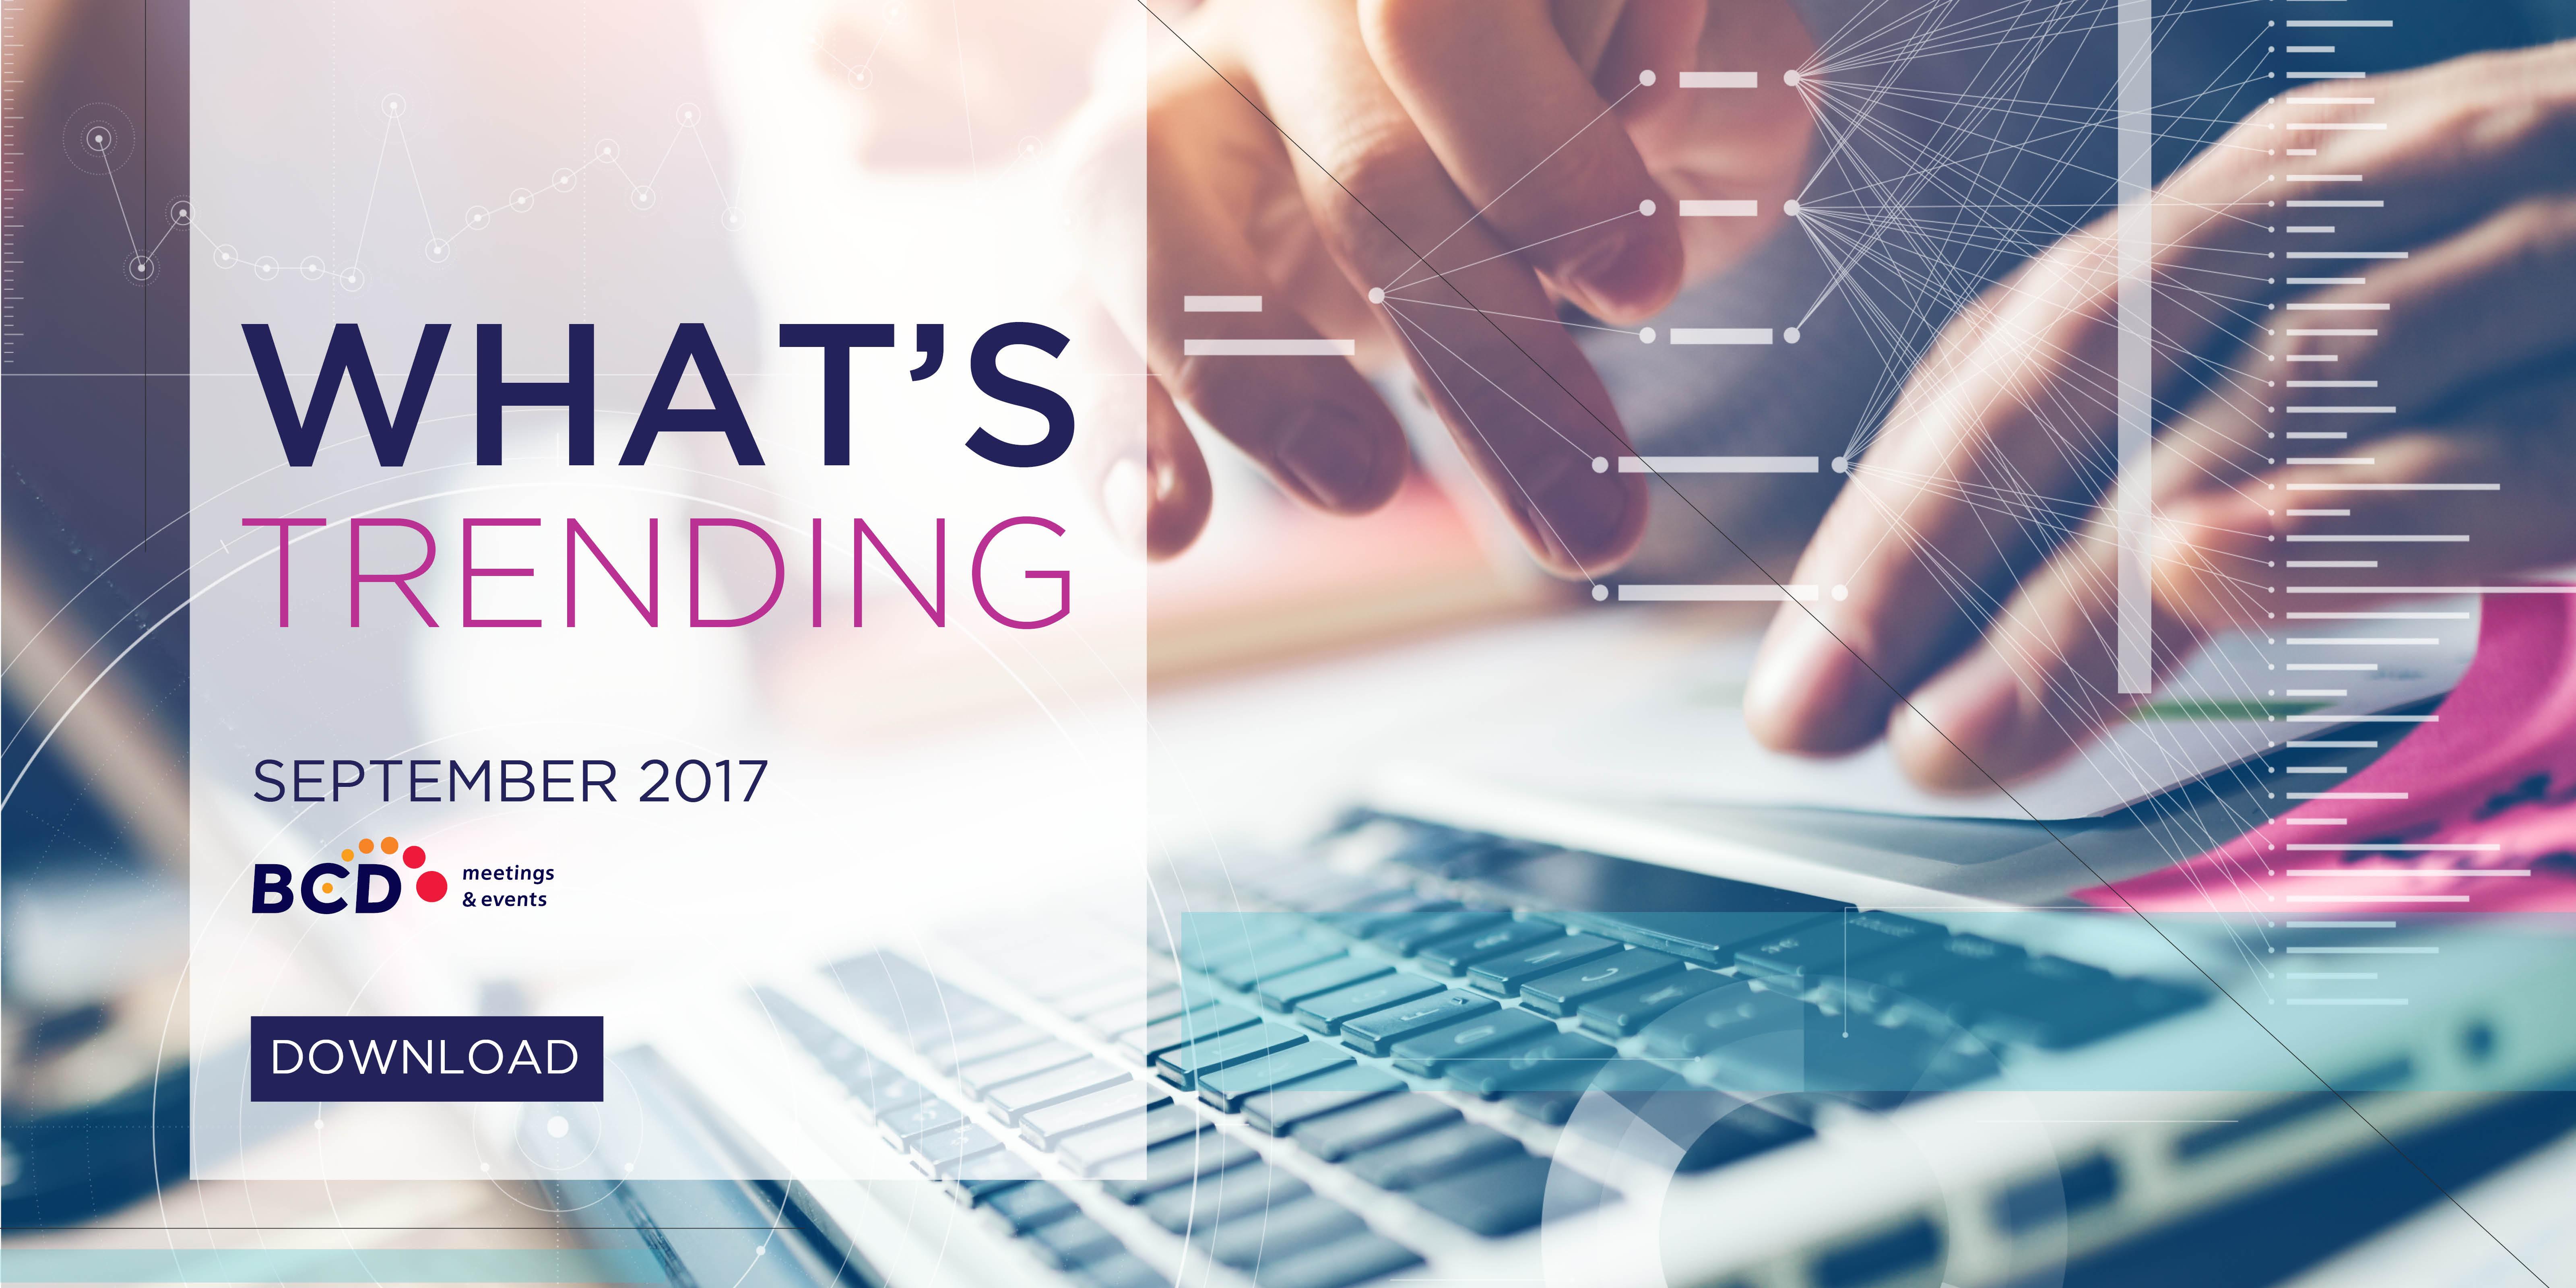 What's Trending September 2017 Download